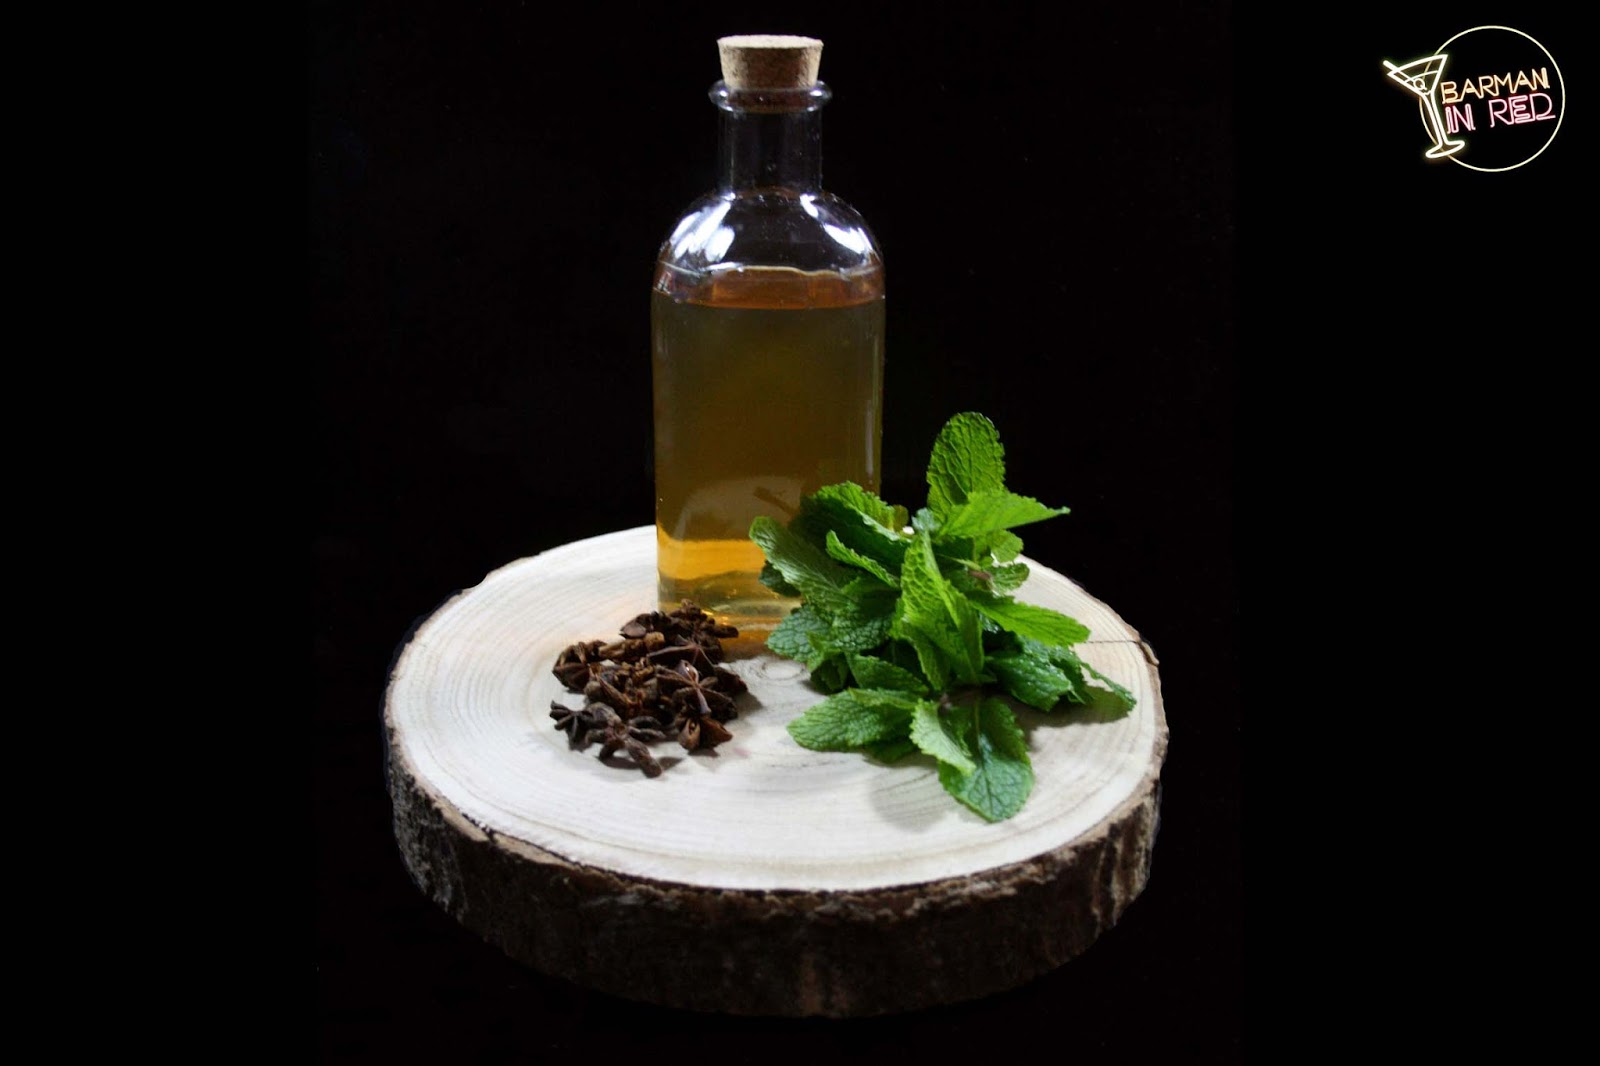 licor de hierbas casero receta